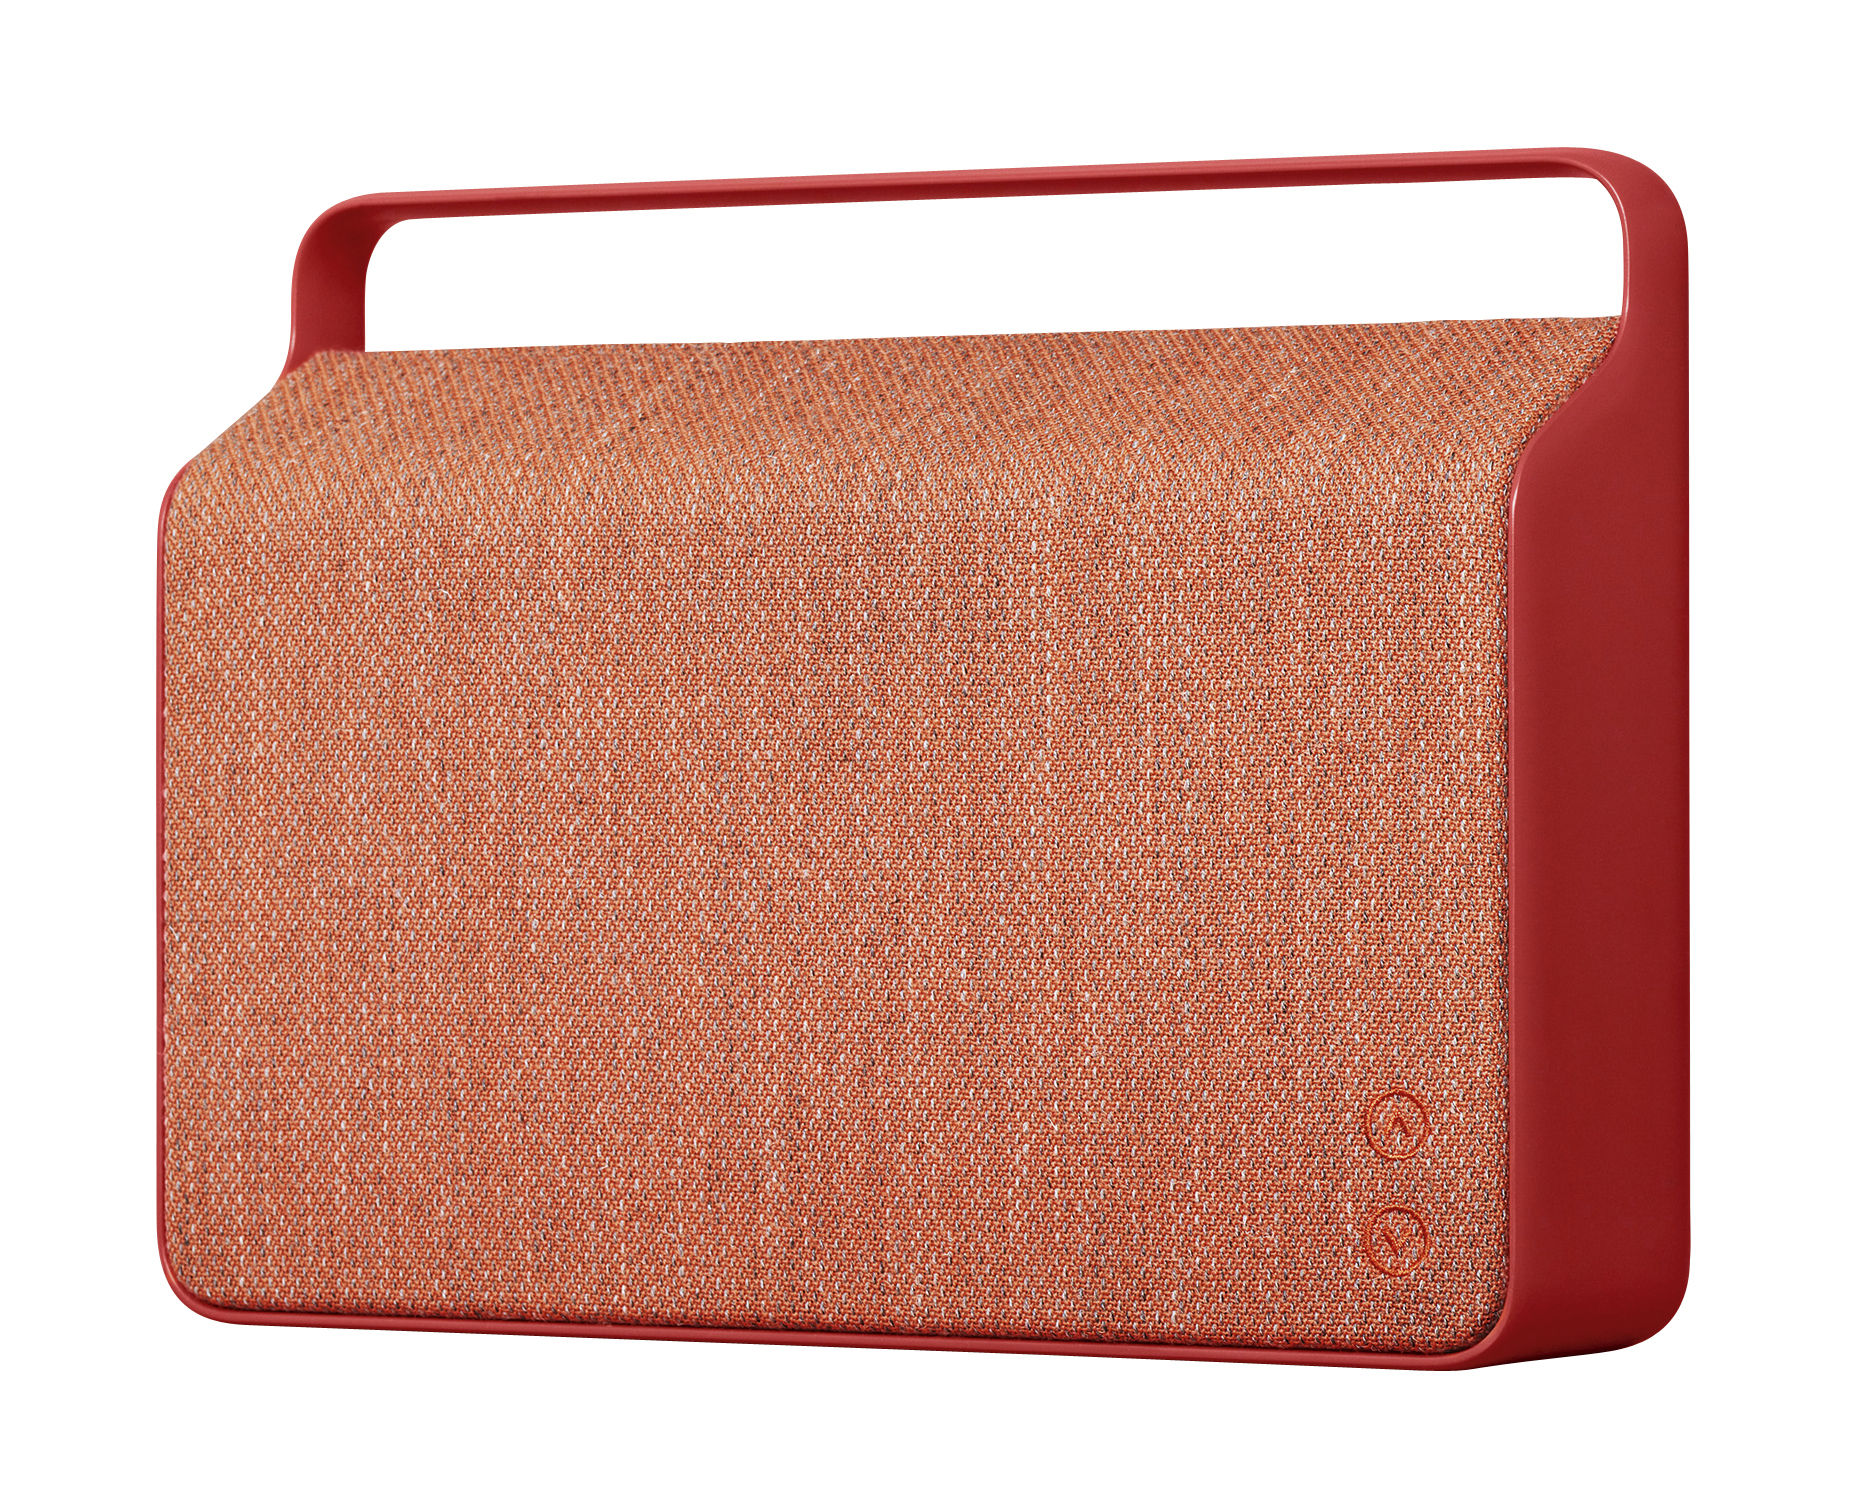 enceinte bluetooth copenhague sans fil tissu poign e alu rouge vifa. Black Bedroom Furniture Sets. Home Design Ideas